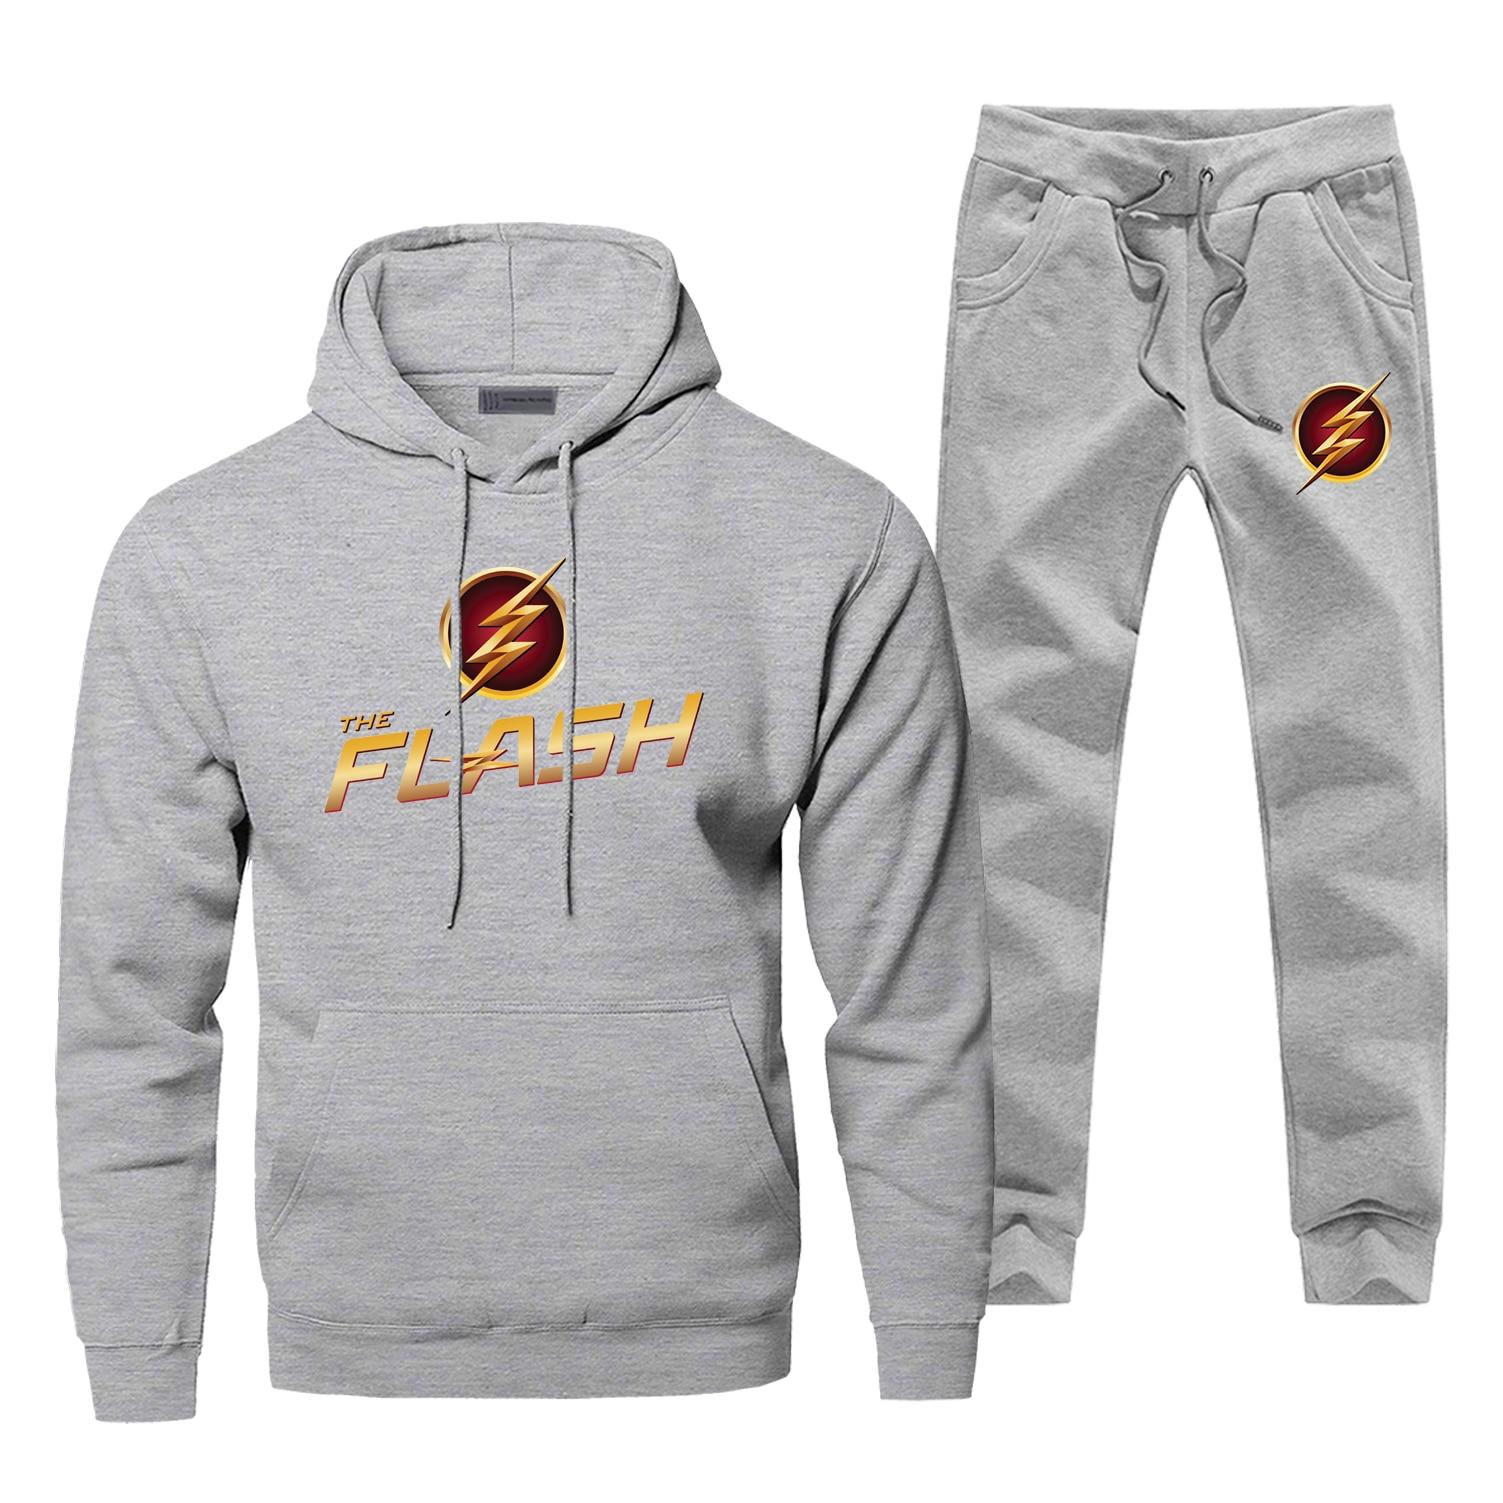 TV Show The Flash Logo Hoodies Gray Black Pants Sweatshirt Cosplay Men's Sets 2019 New Arrival Winter Warm Fleece Sportsman Wear